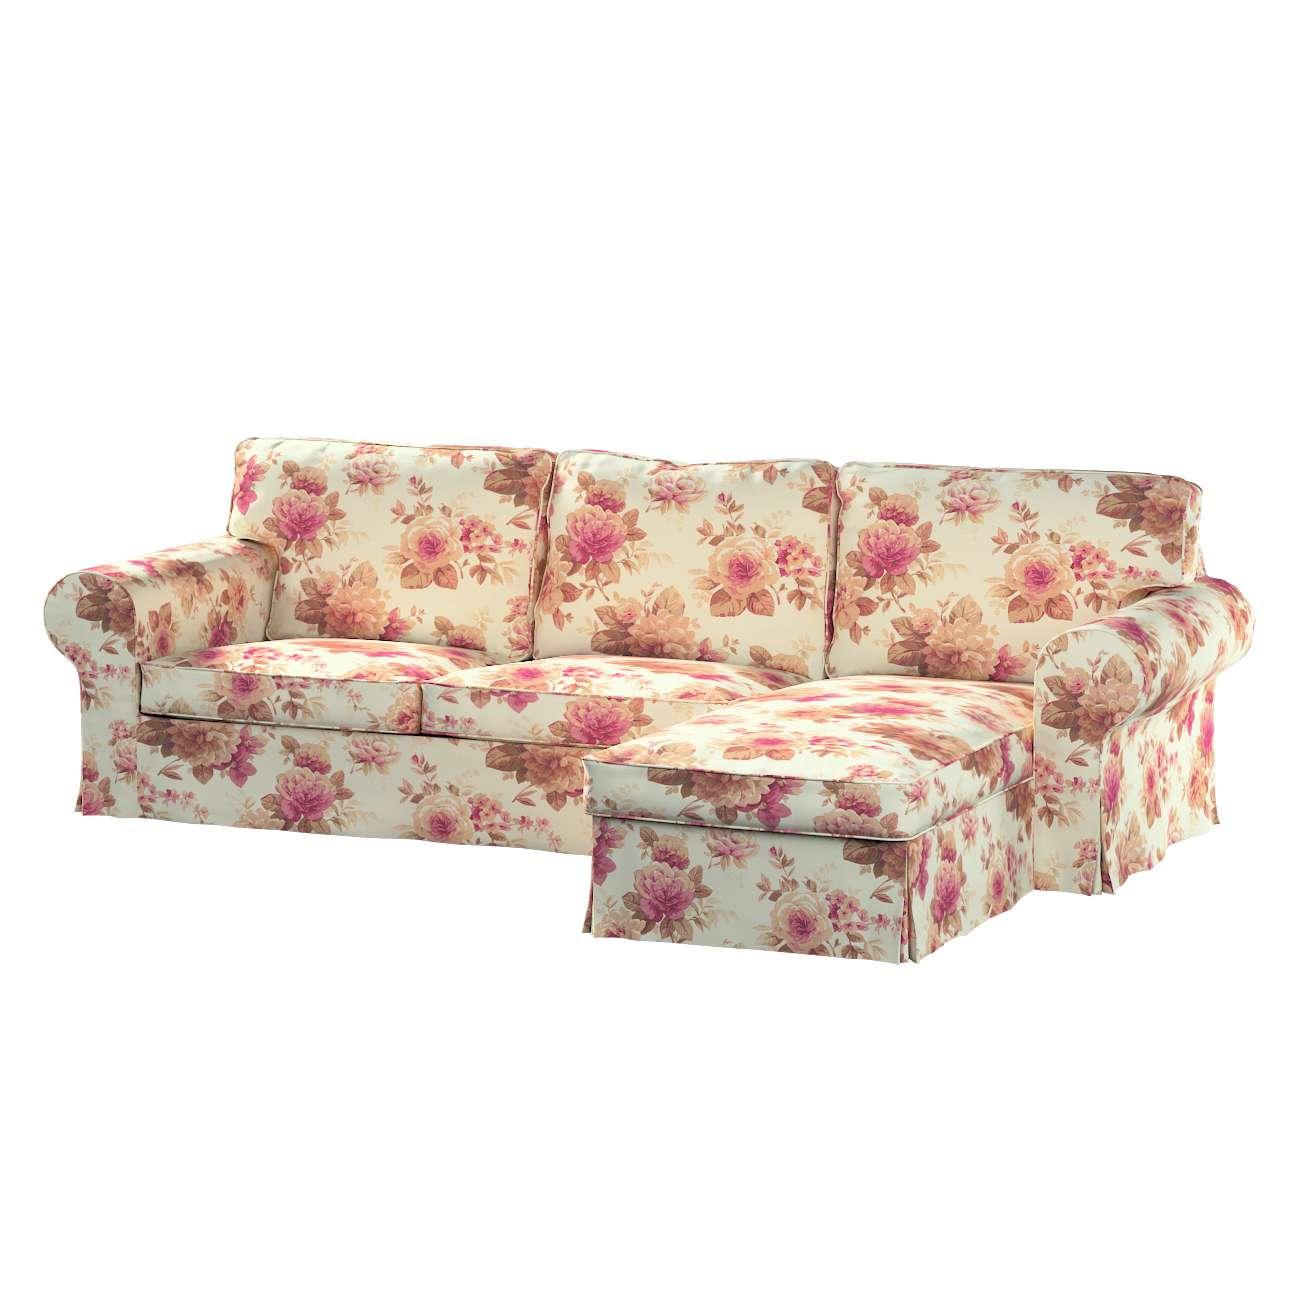 Potah na pohovku IKEA Ektorp 2-místná se šezlongem sofa ektorp 2-0s. i leżanka v kolekci Mirella, látka: 141-06